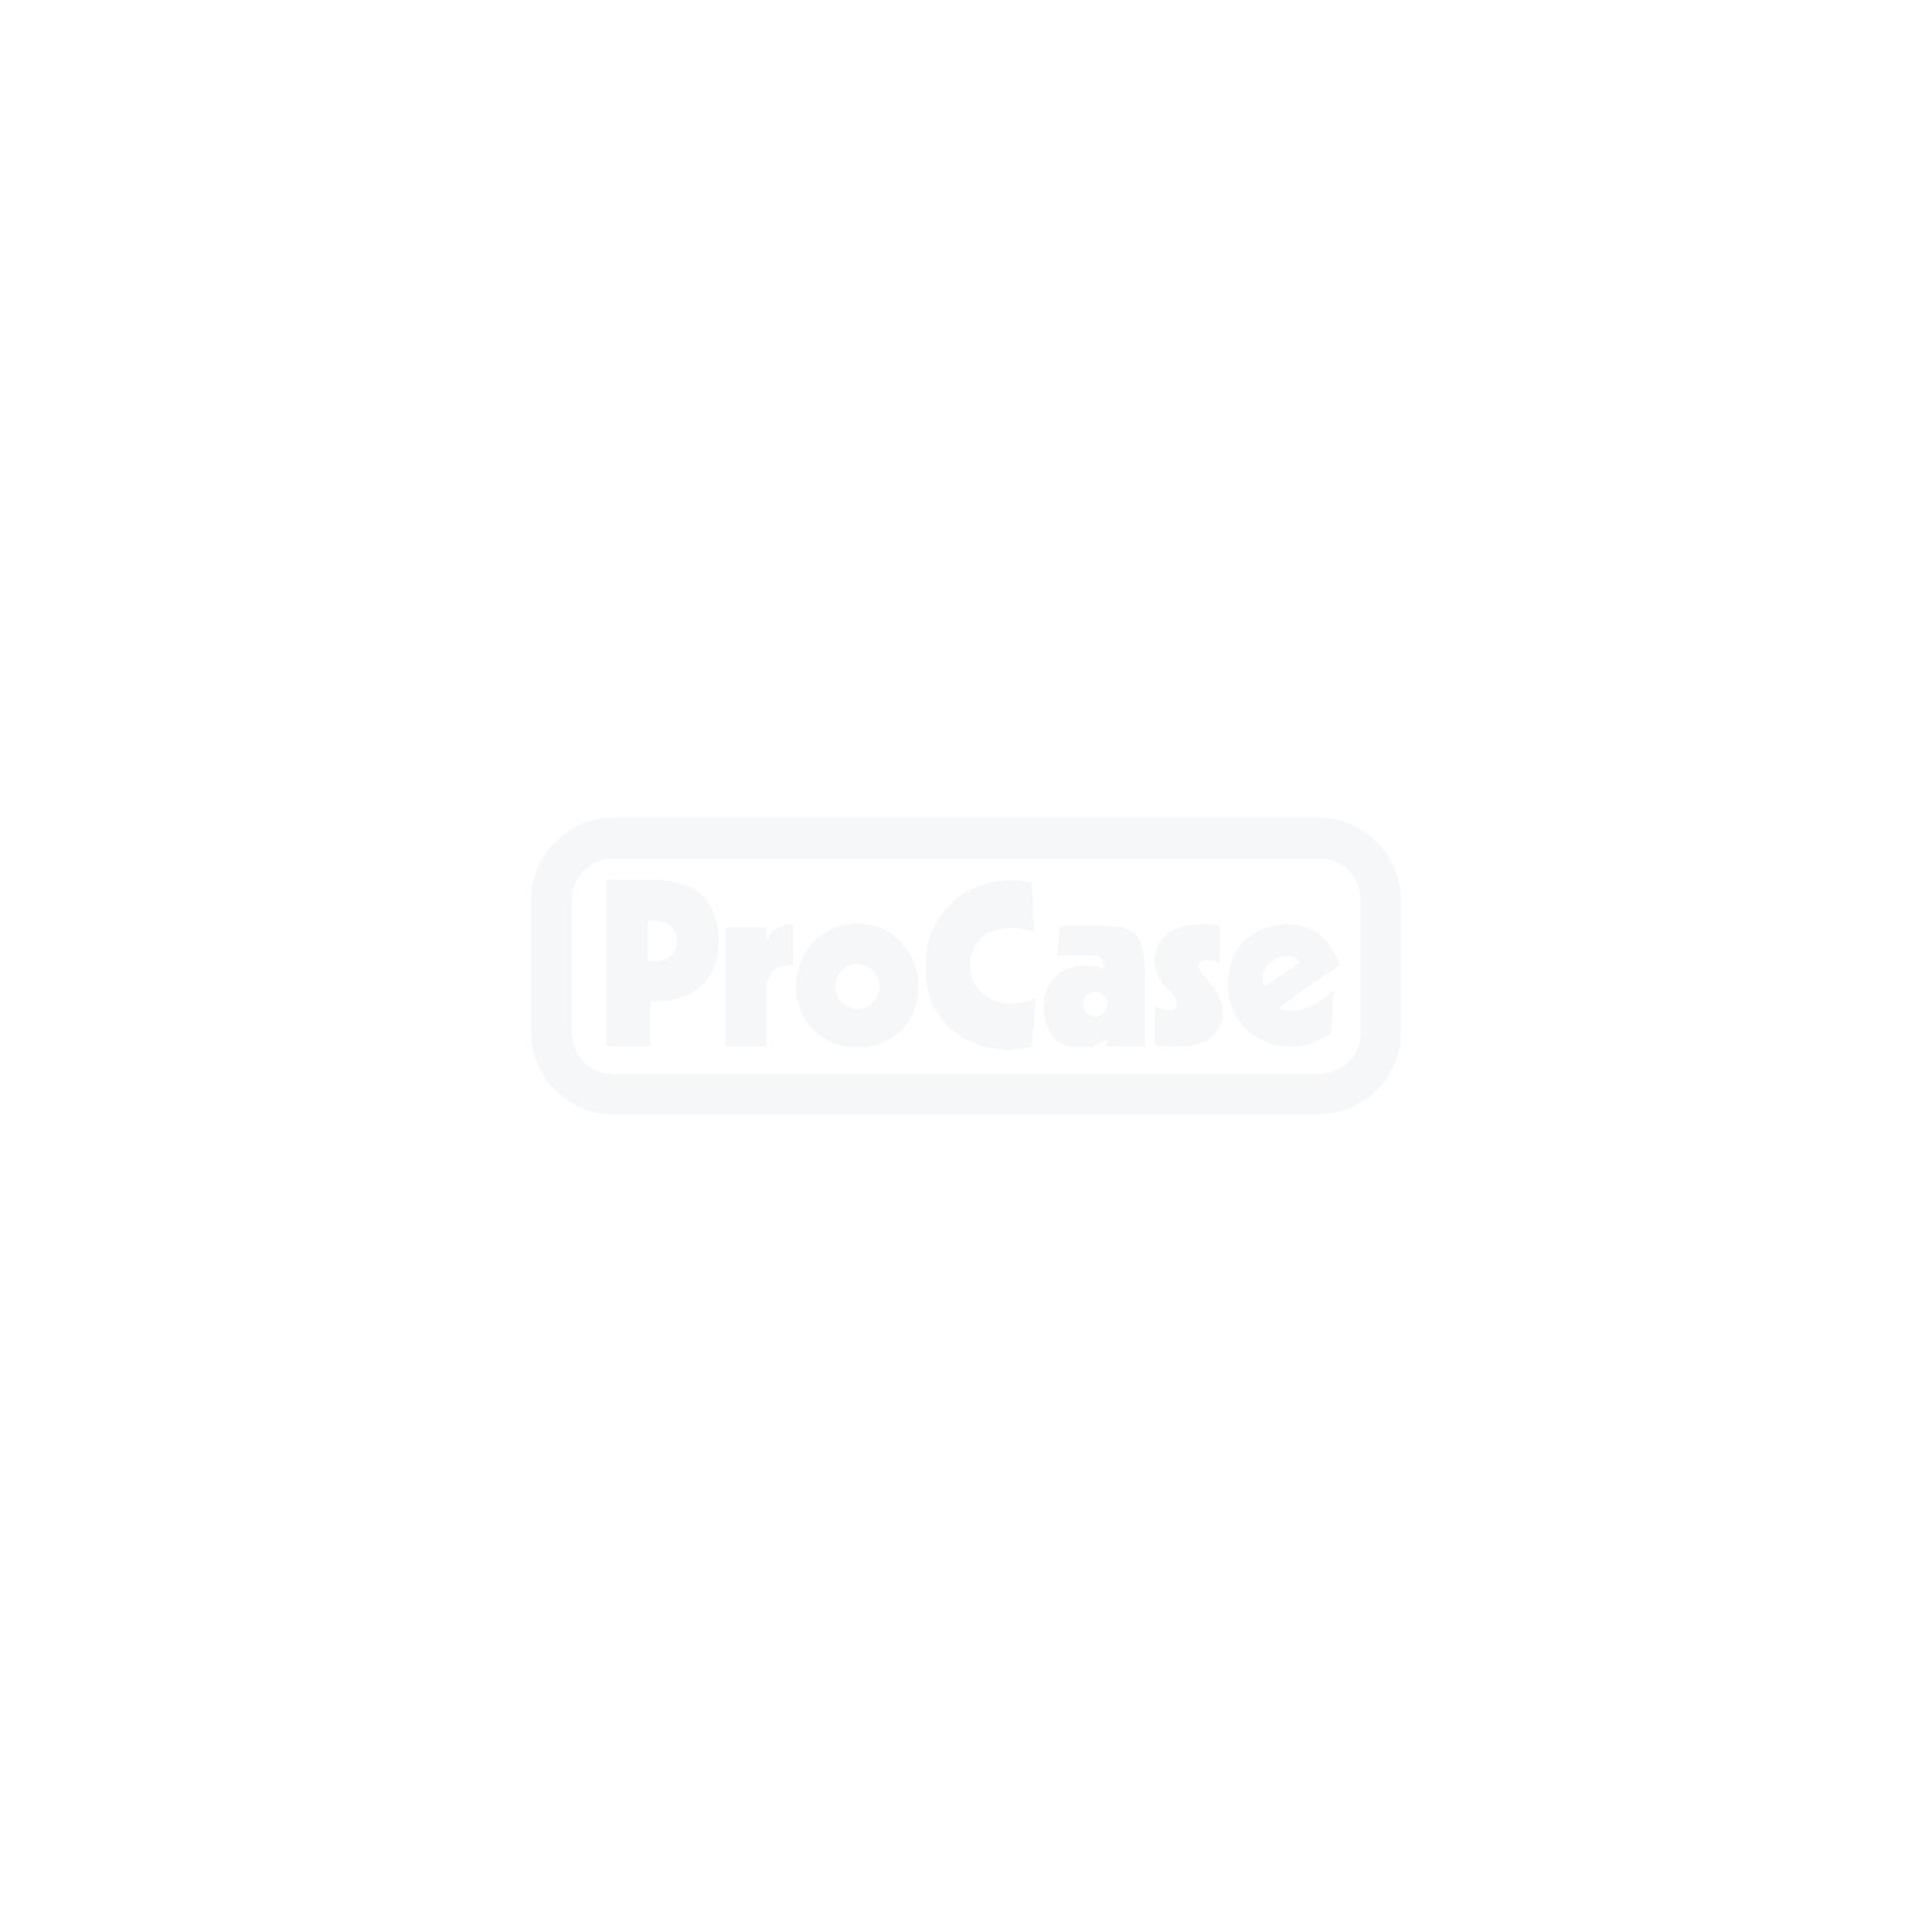 Flightcase für 2 d&b audiotechnik Y7P/Y10P 2